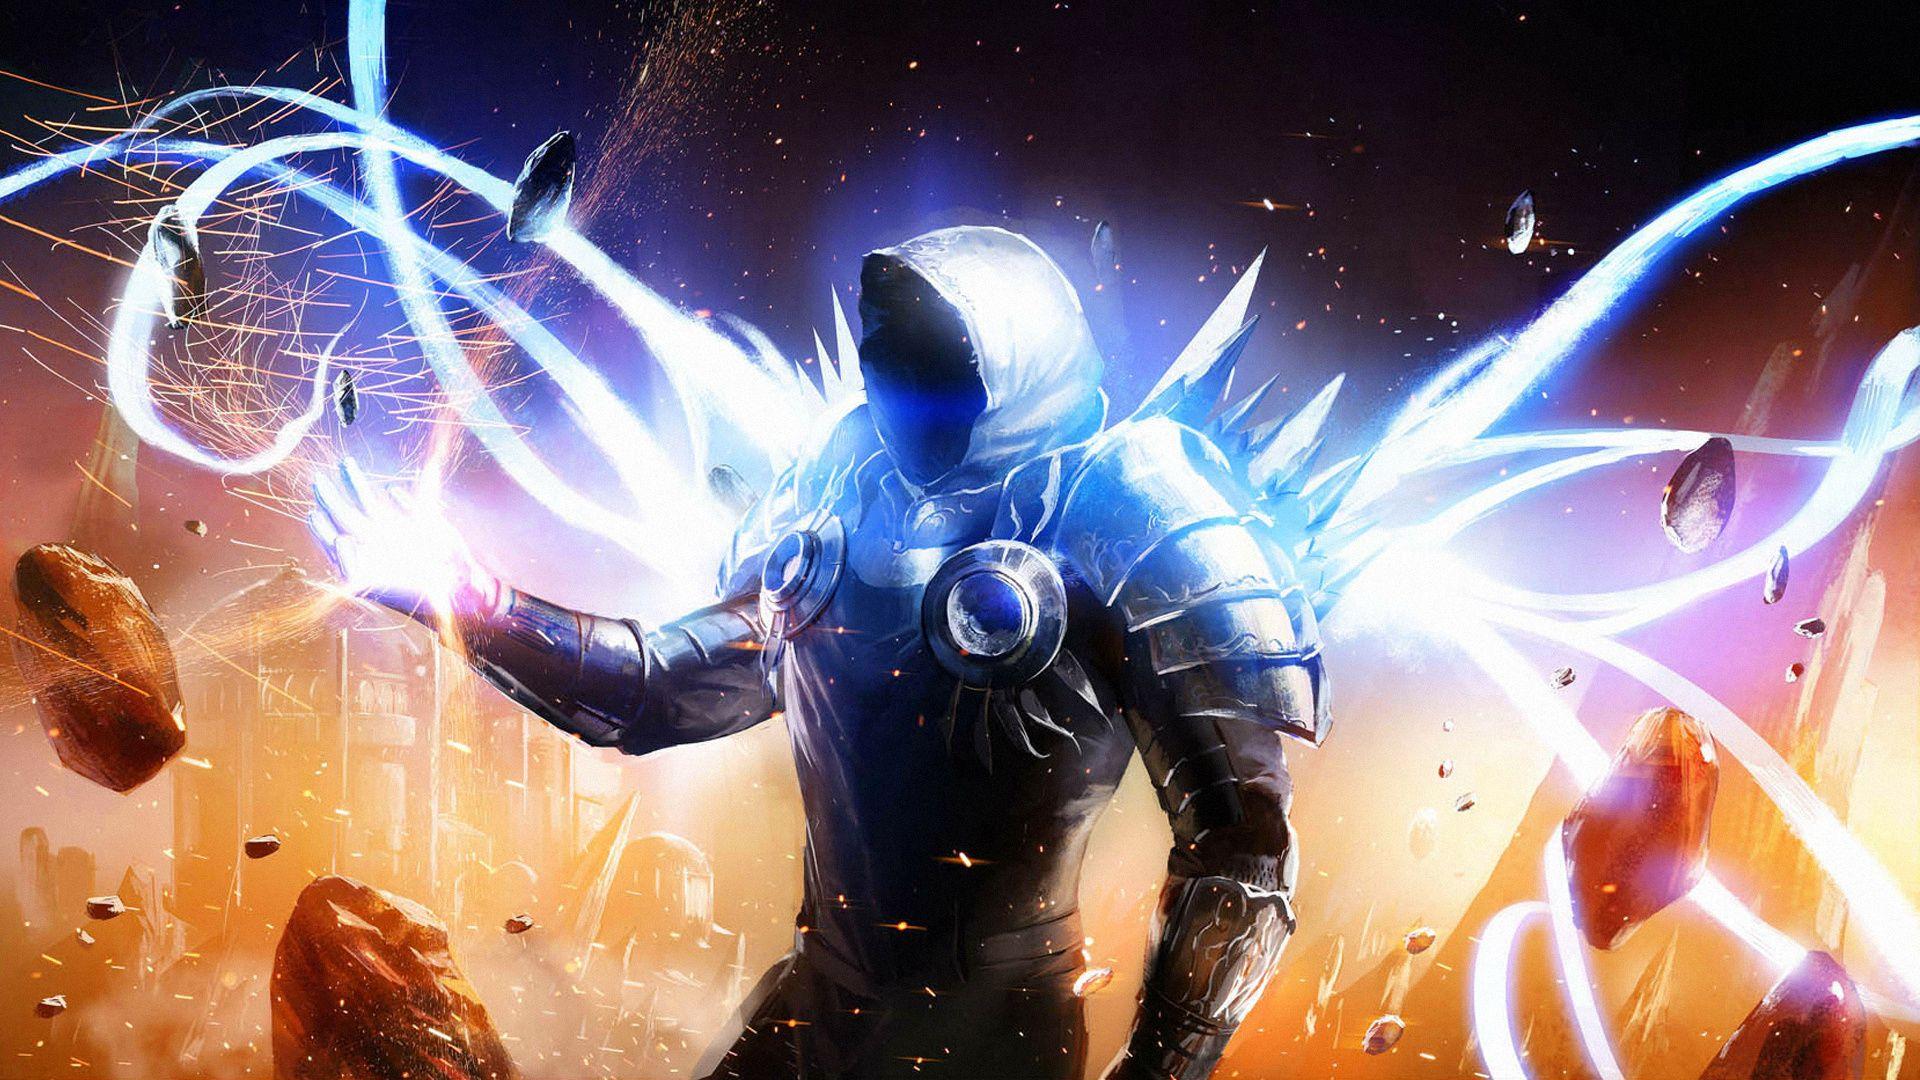 Diablo 3 Reaper Of Souls Tyrael Hd Wallpaper 3694 Frenzia Com Cool Desktop Backgrounds Character Wallpaper Art